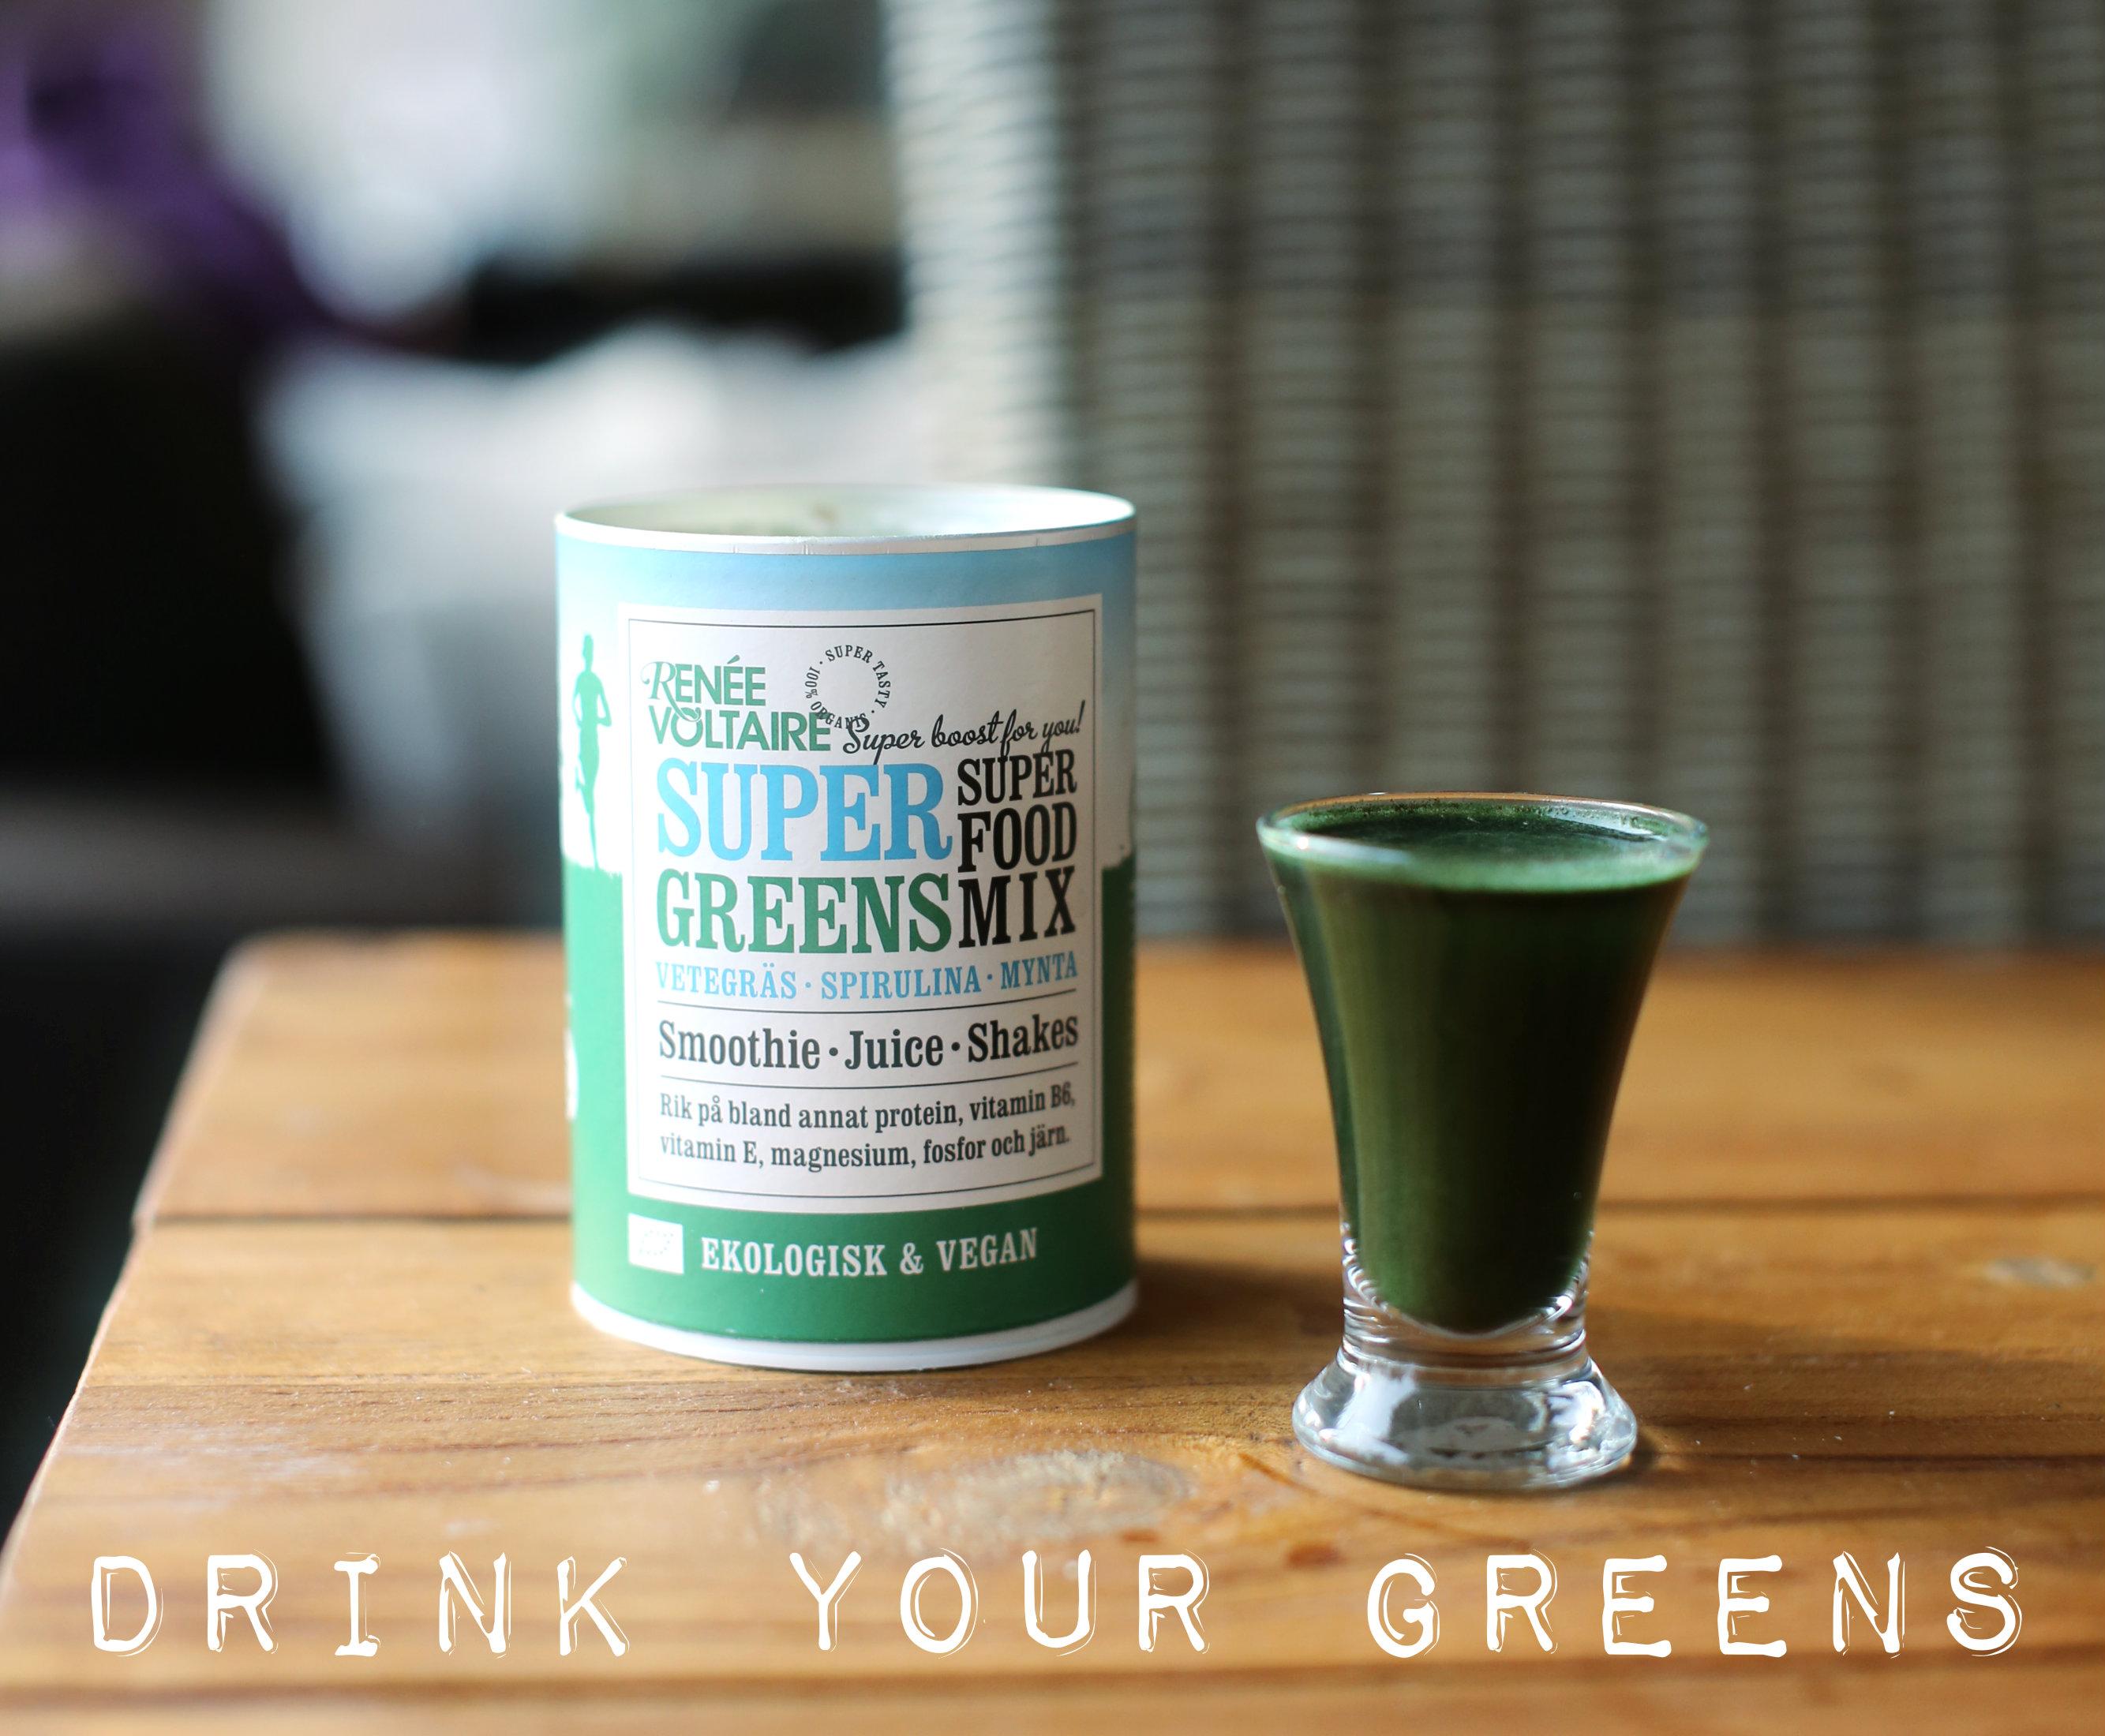 drinkyourgreens-nu3